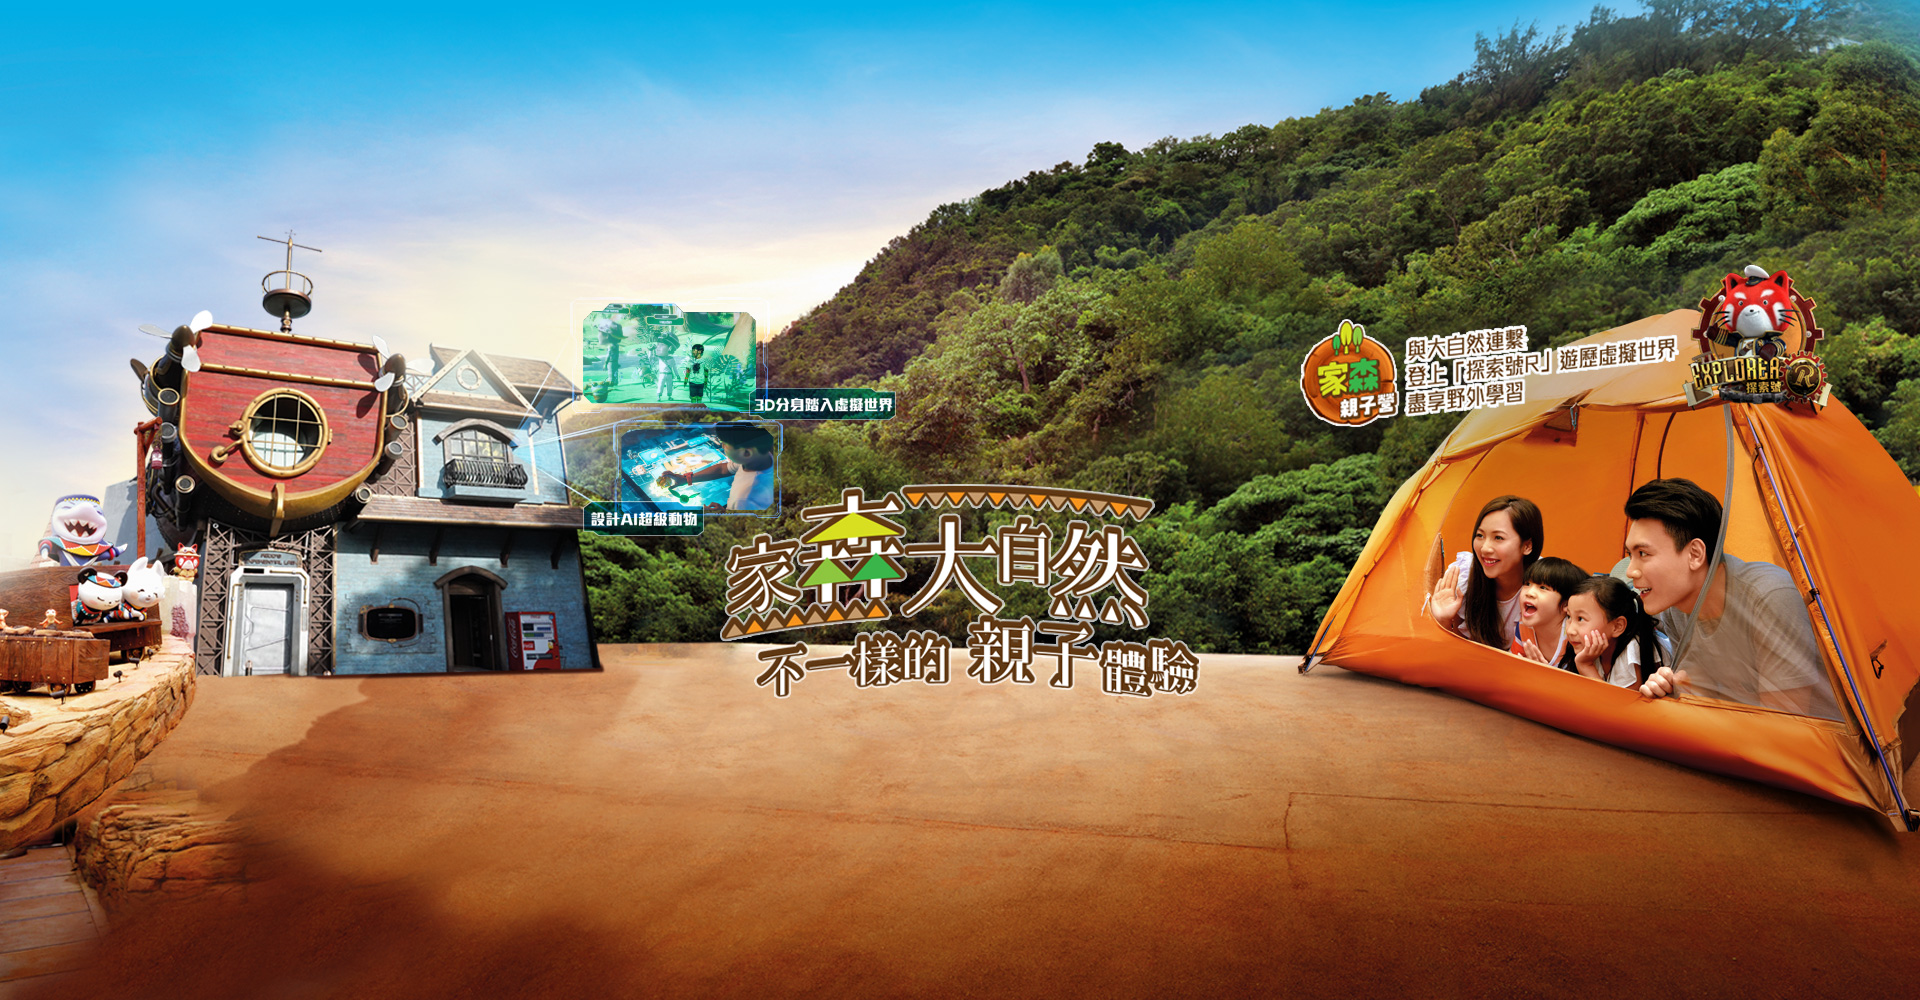 https://media.oceanpark.com.hk/files/s3fs-public/insidepage_desktop_tc.jpg